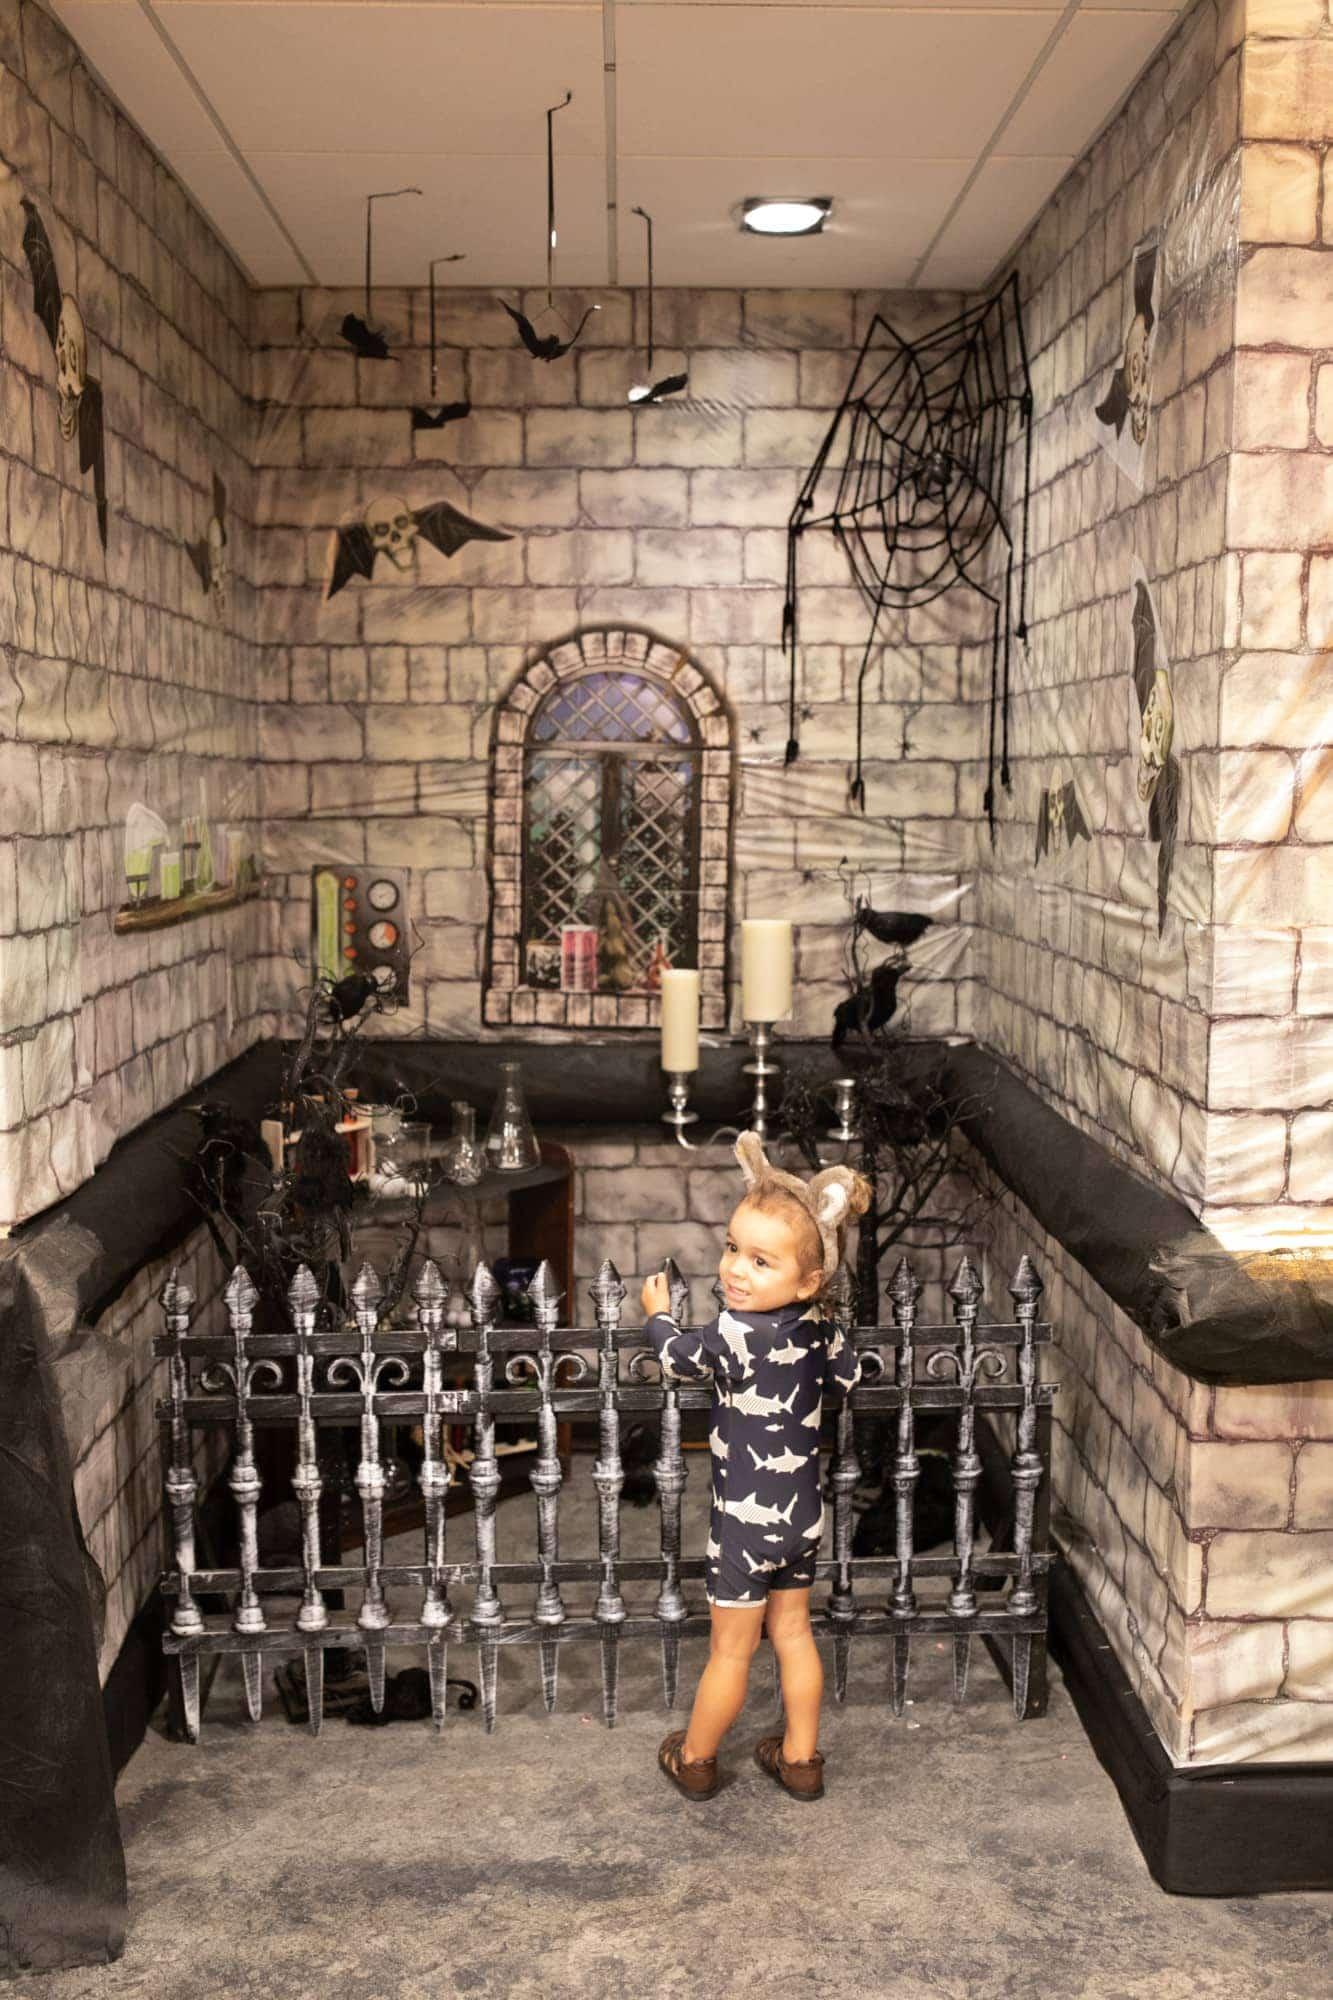 toddler in spooky hallway